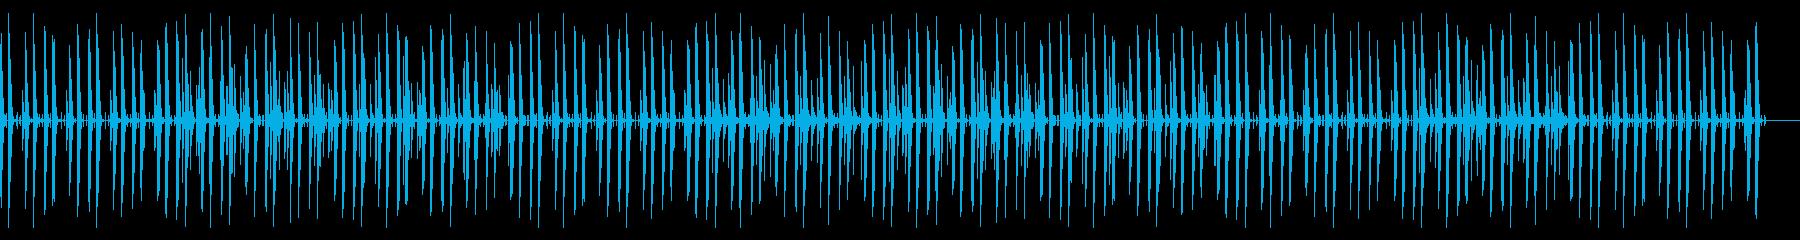 YouTubeなどのほのぼのBGMの再生済みの波形